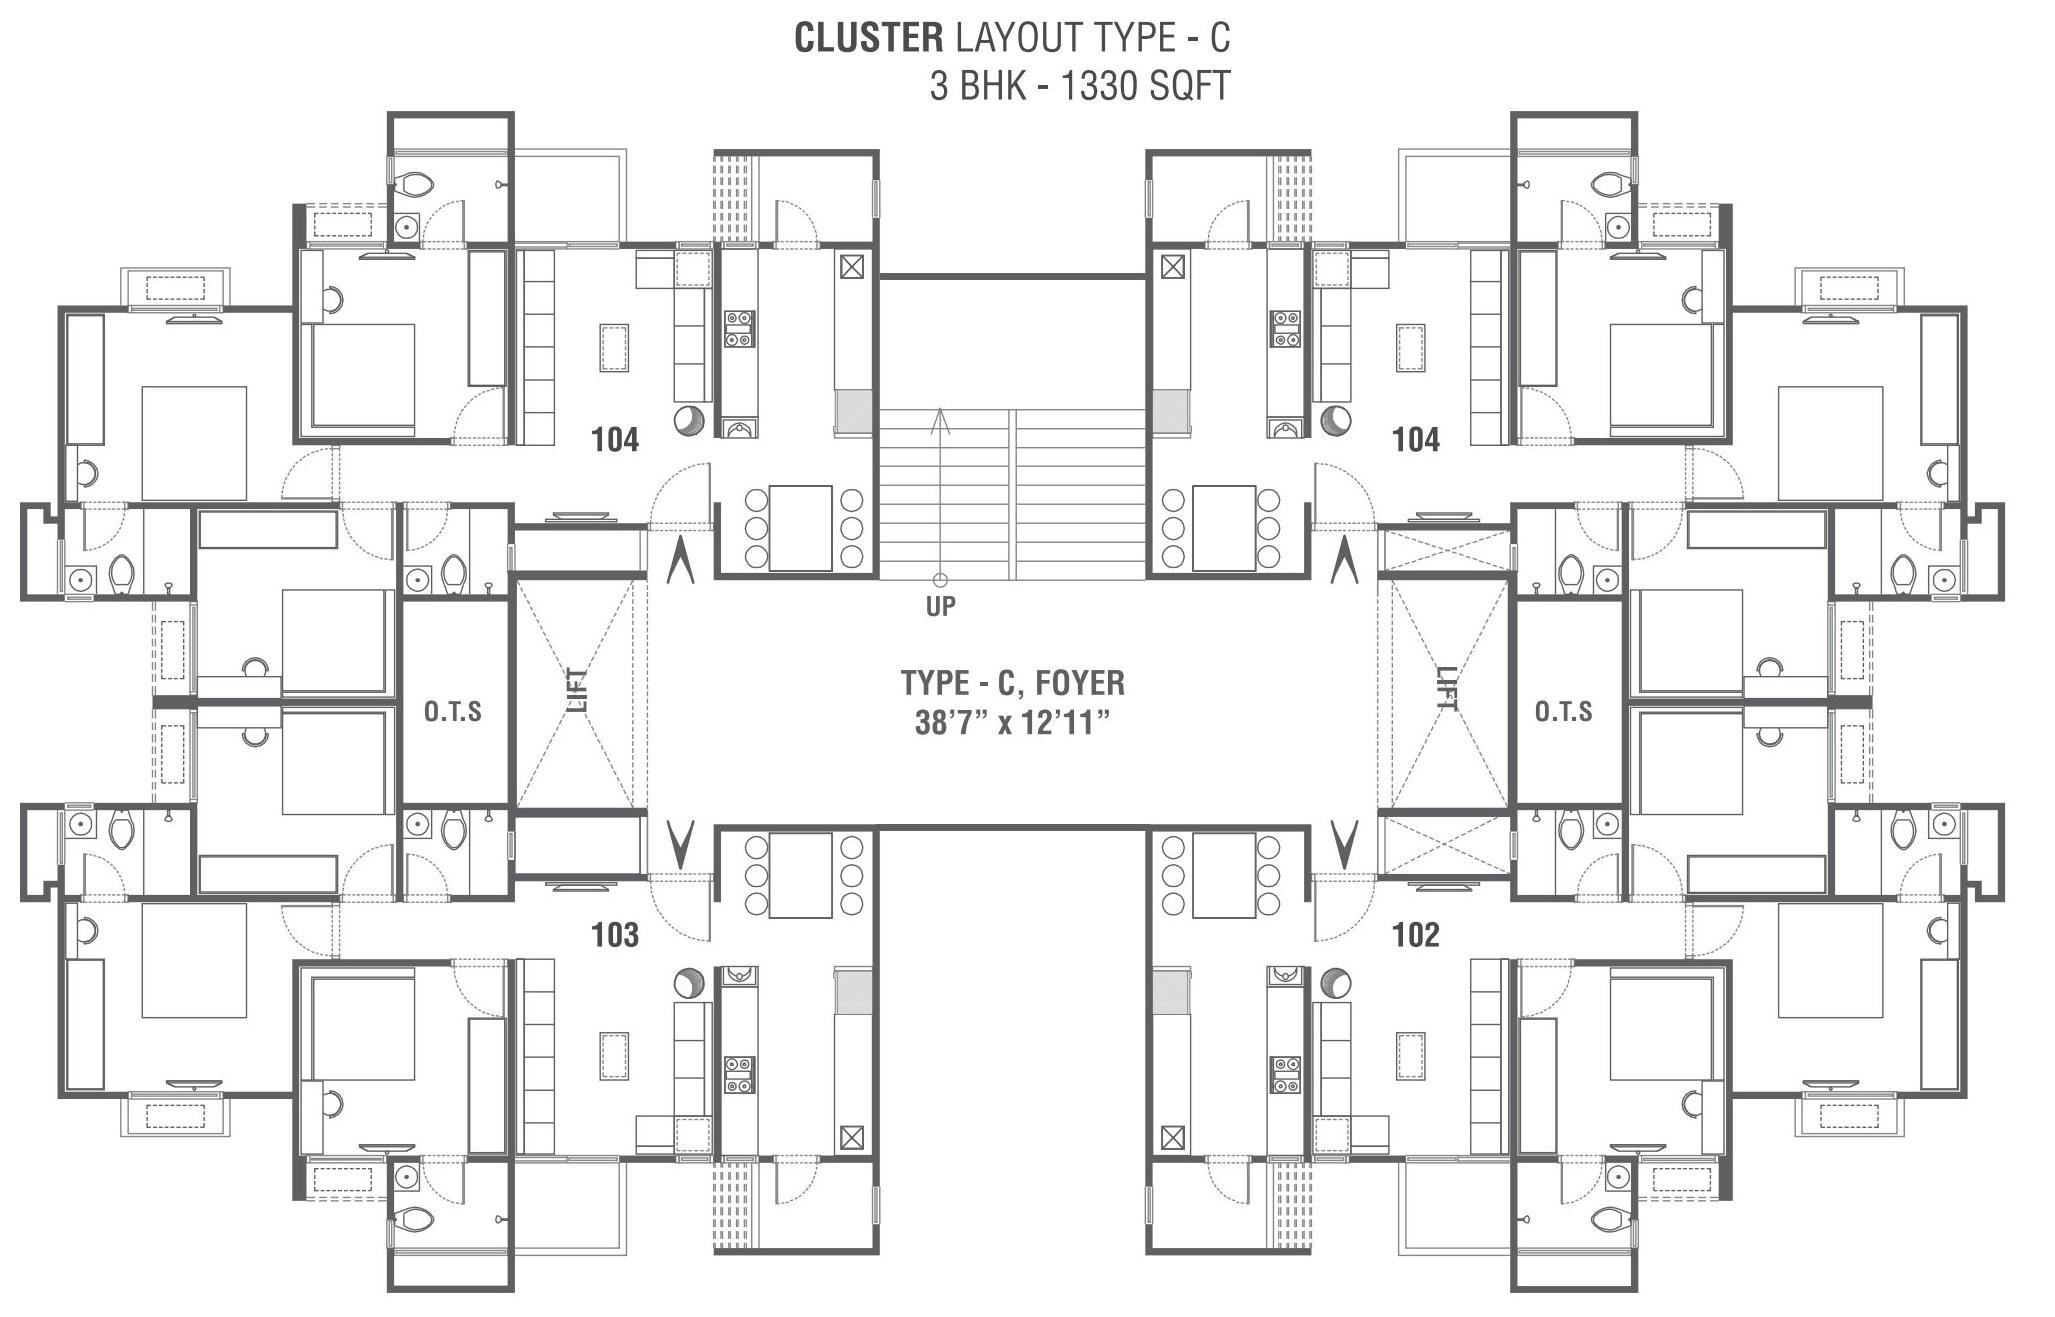 100 38 floor plans of a nice retail floor plan for Retail floor plan software